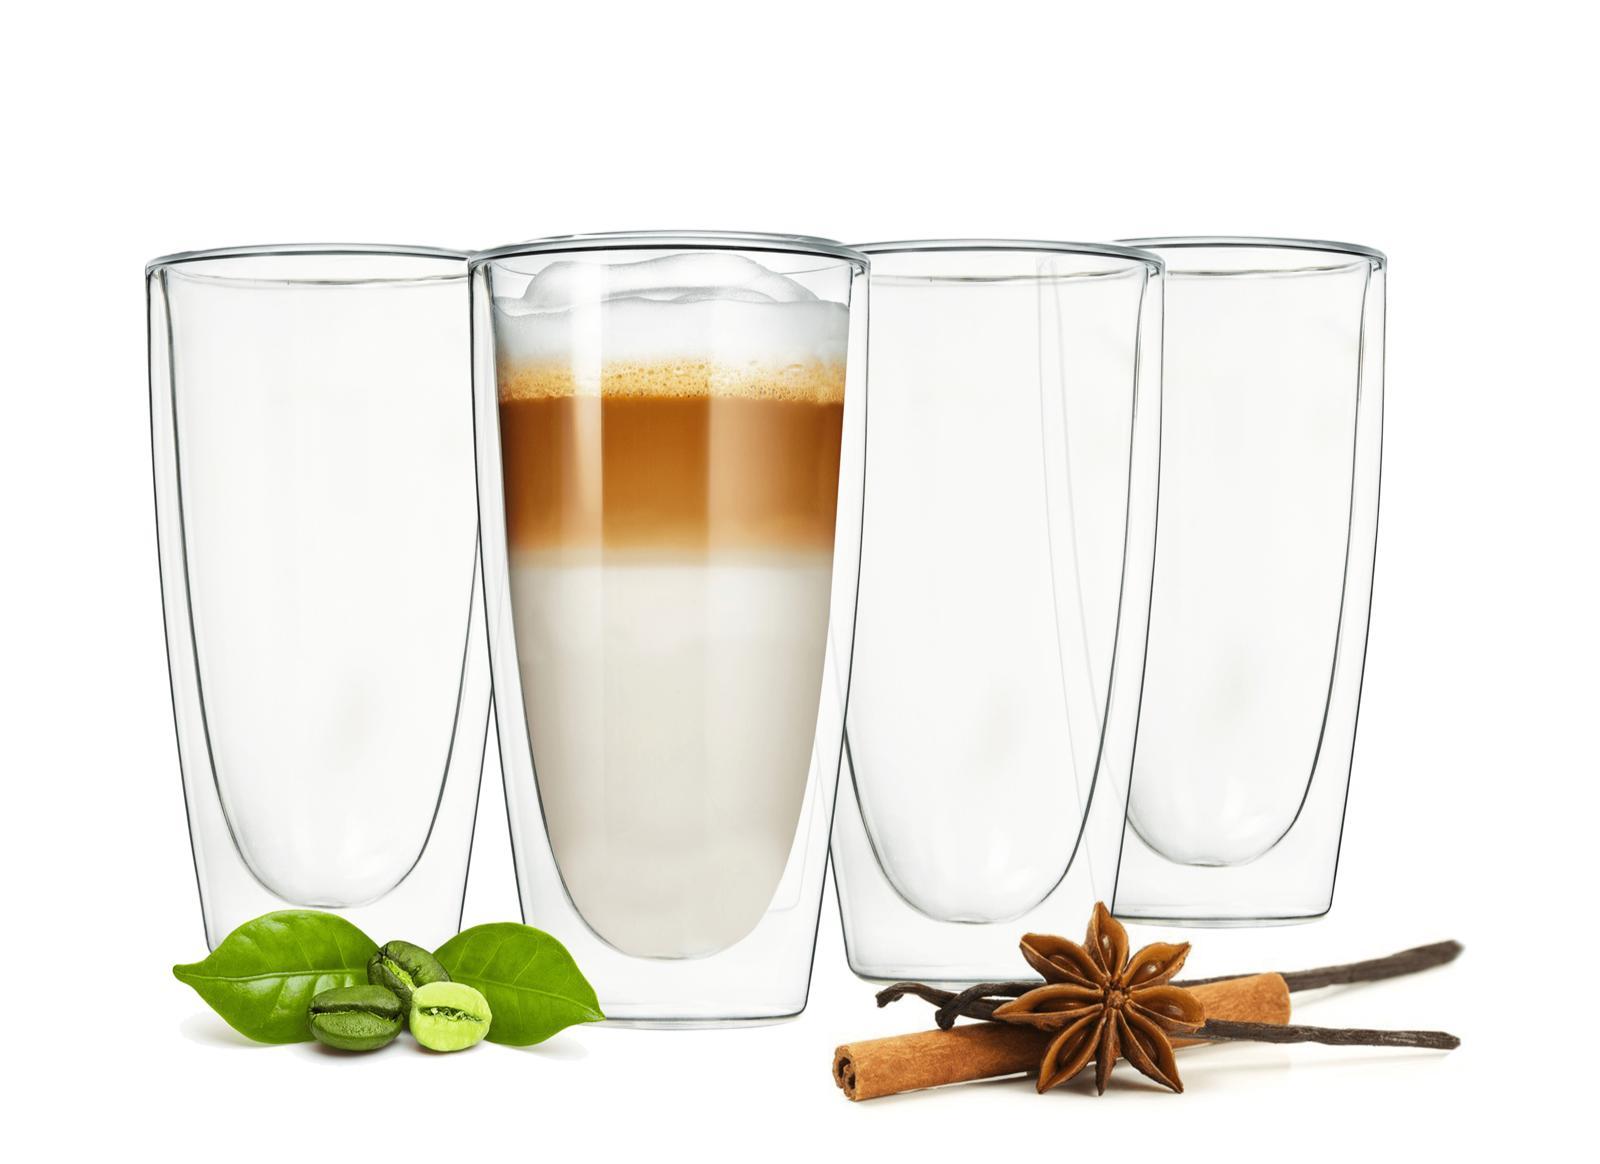 4 doppelwandige latte macchiato gl ser 300ml mit 4 edelstahl l ffel kaffeegl ser ebay. Black Bedroom Furniture Sets. Home Design Ideas